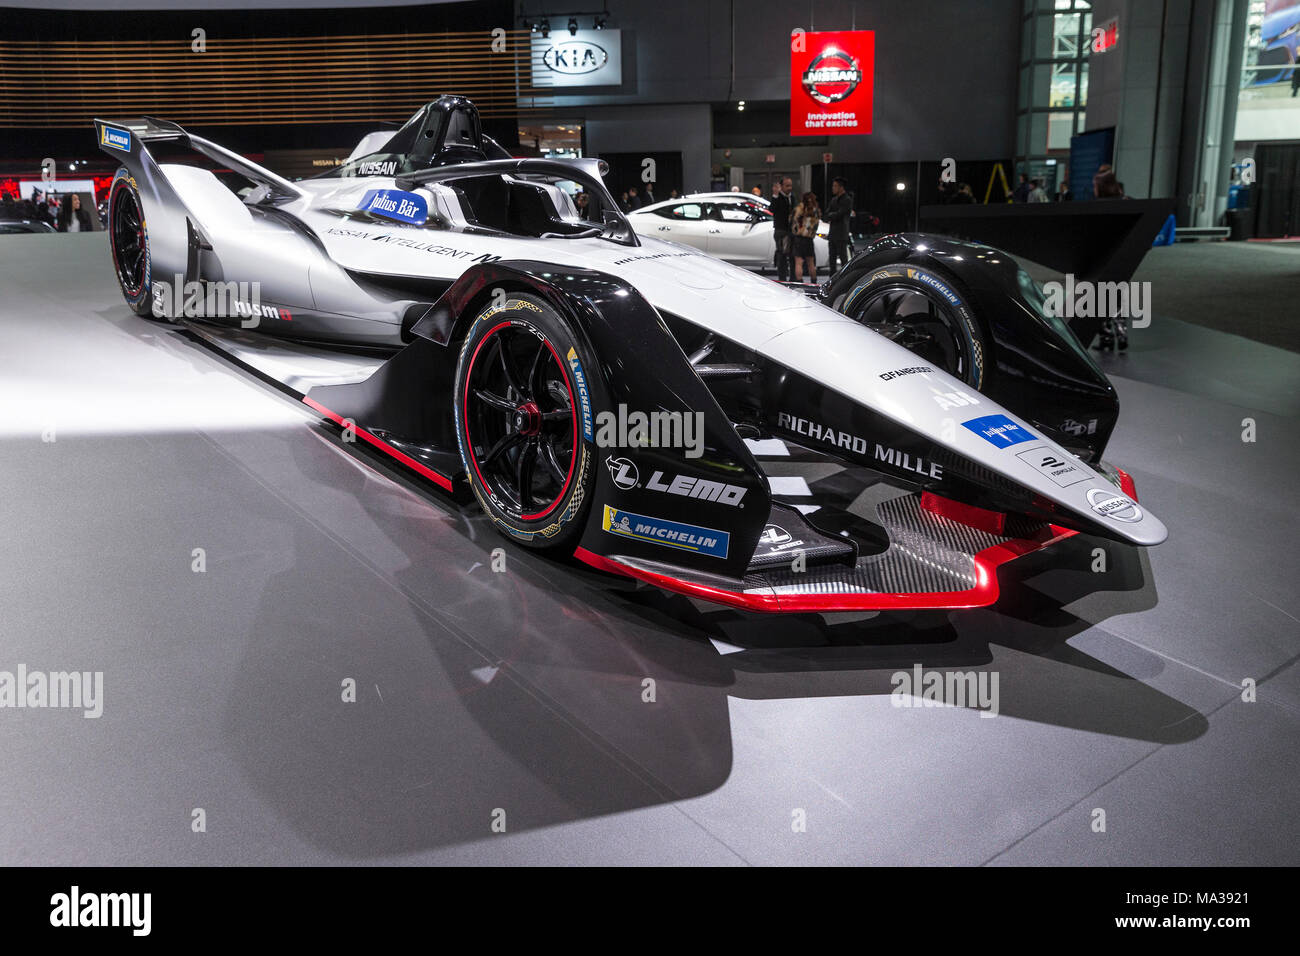 Nissan Race Car Formula E On Display In Nissan Pavilion At New - Javits car show